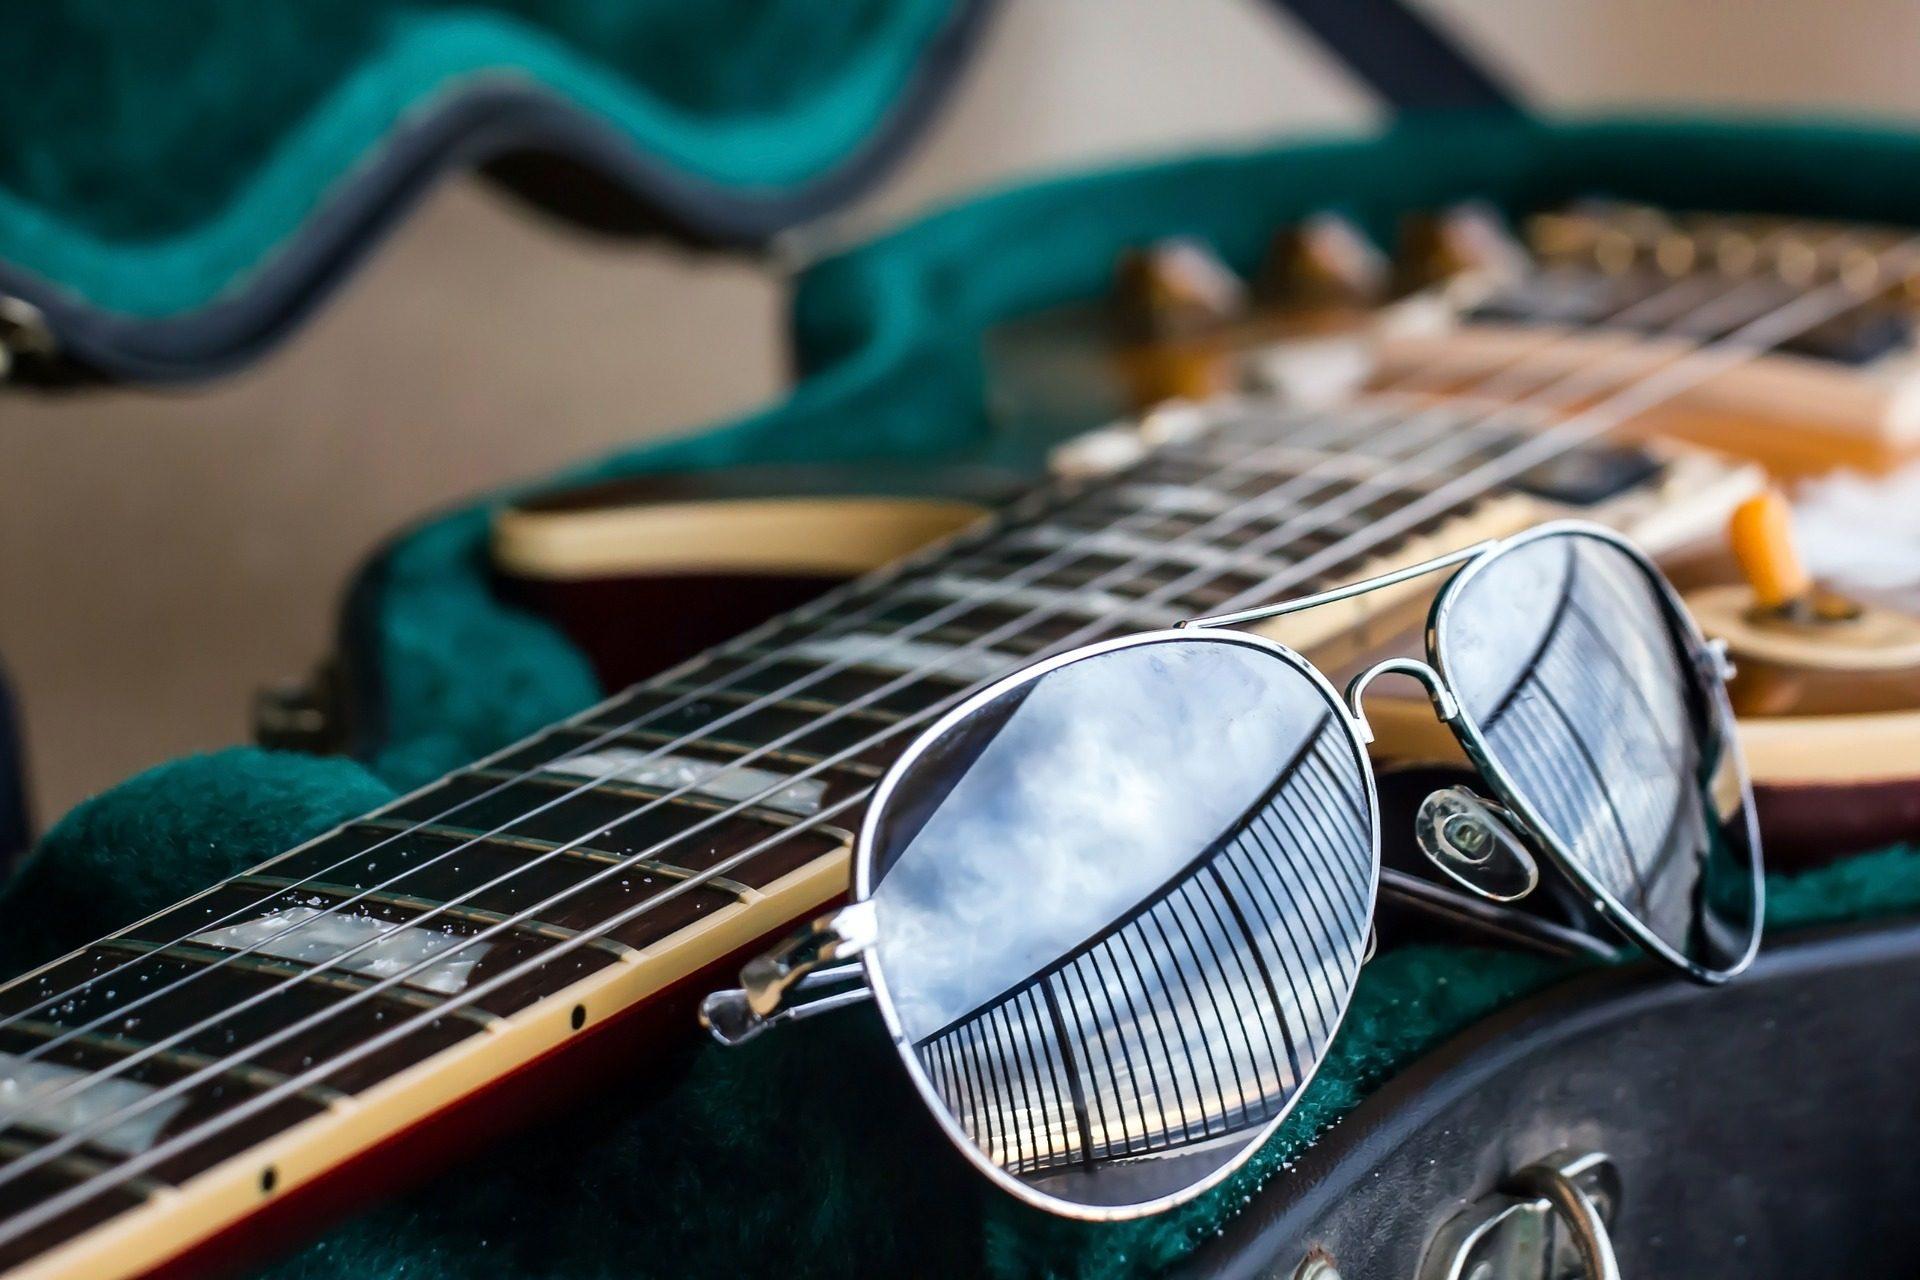 Guitarra, óculos de sol, mastro, cadeias de caracteres, reflexão - Papéis de parede HD - Professor-falken.com